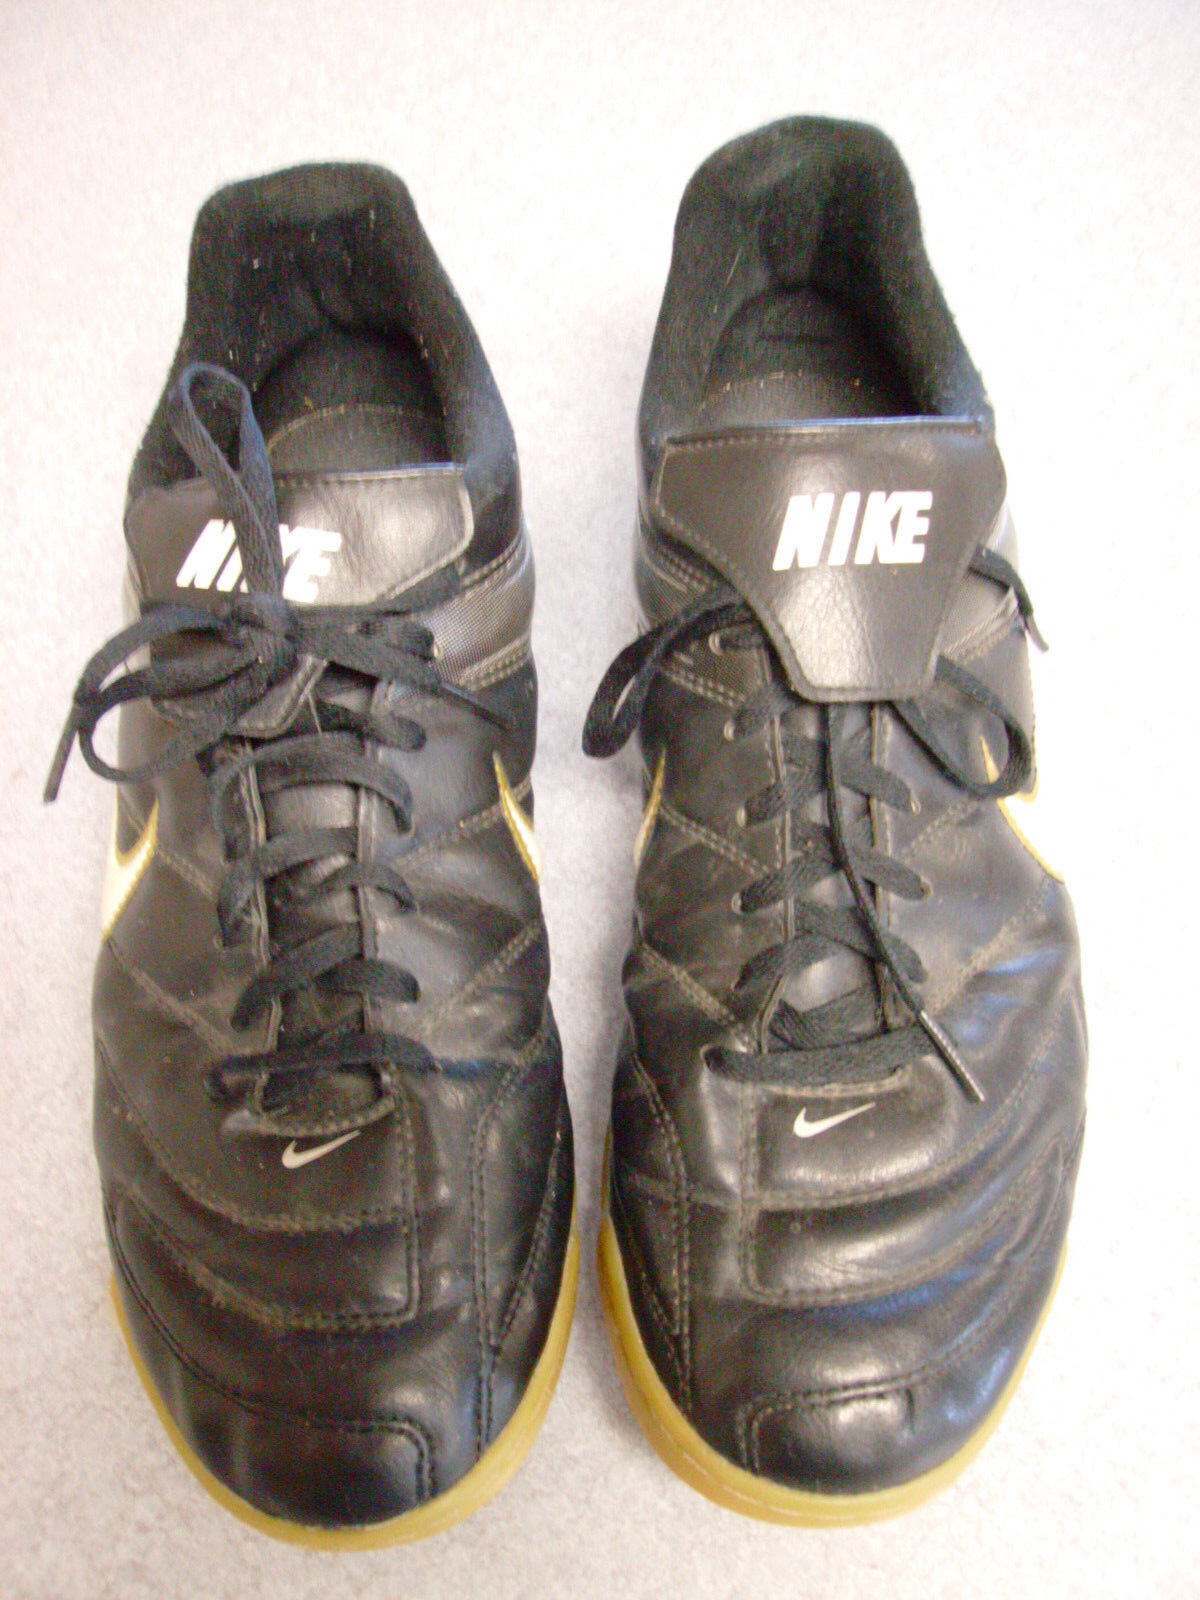 half off c76db fde5b Nike Park II IC (359614 (359614 (359614 017) Black Shoes Soccer Men Size 10  - 44 077d5f